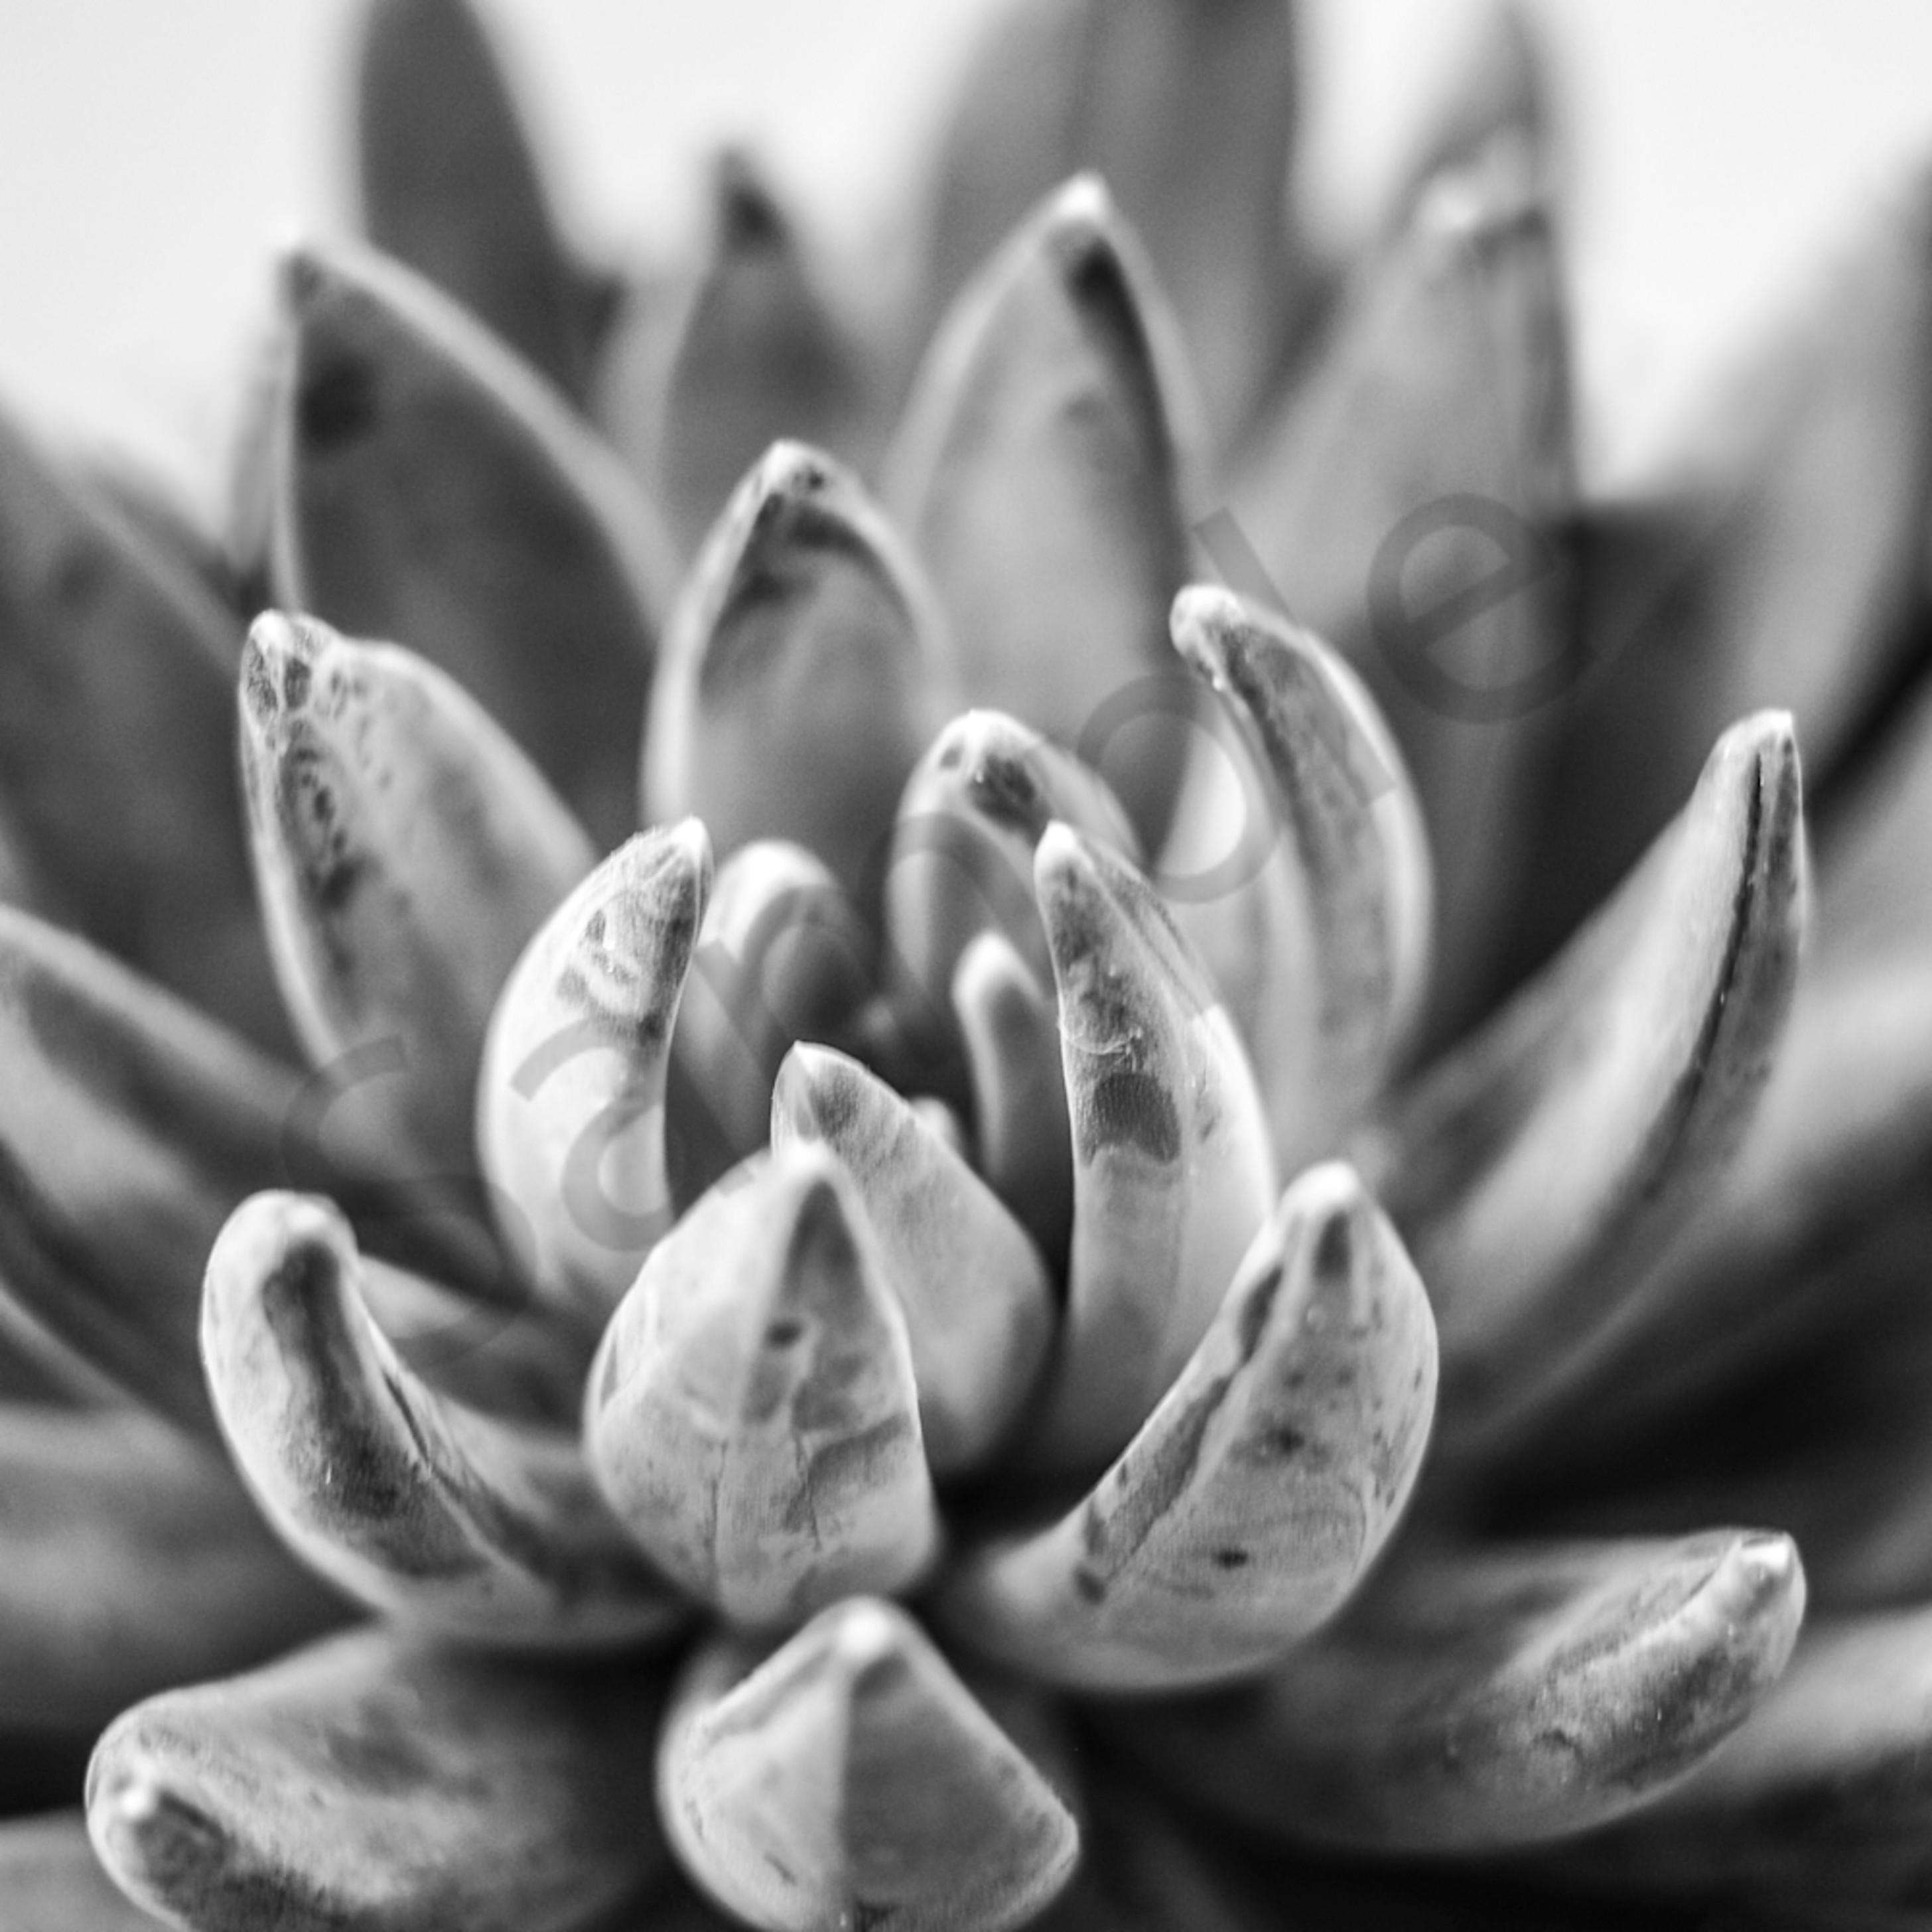 Succulent cactus detail horizontal desert arid palm springs potted eco friendly drought tolerant garden variety cwb7jx